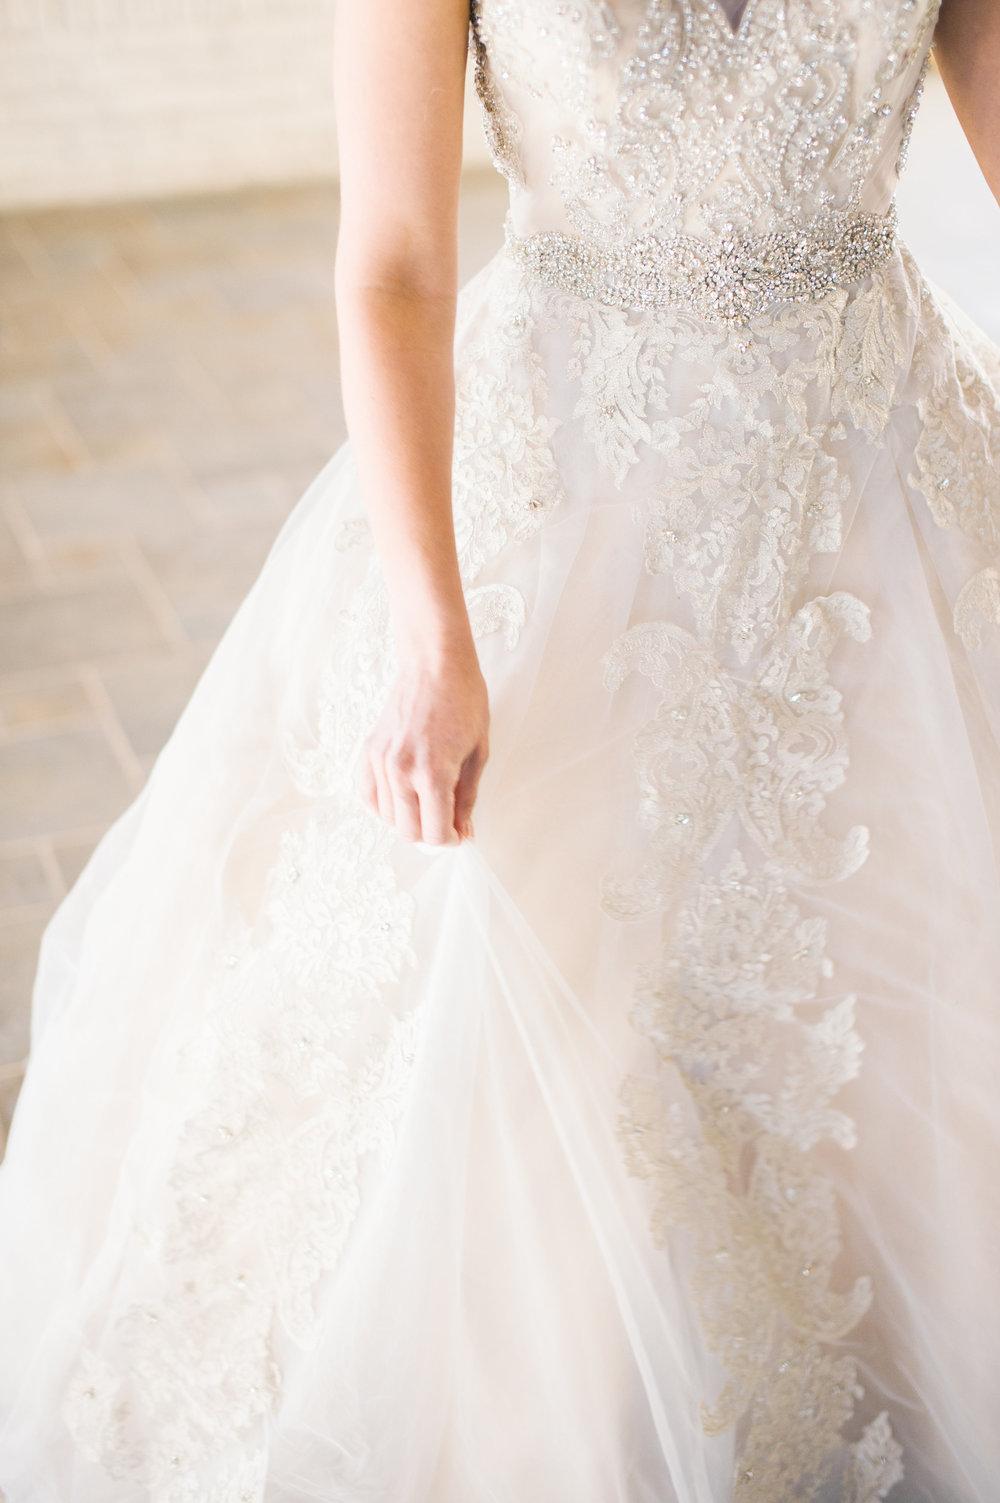 weddinginspirationtheweddingdress